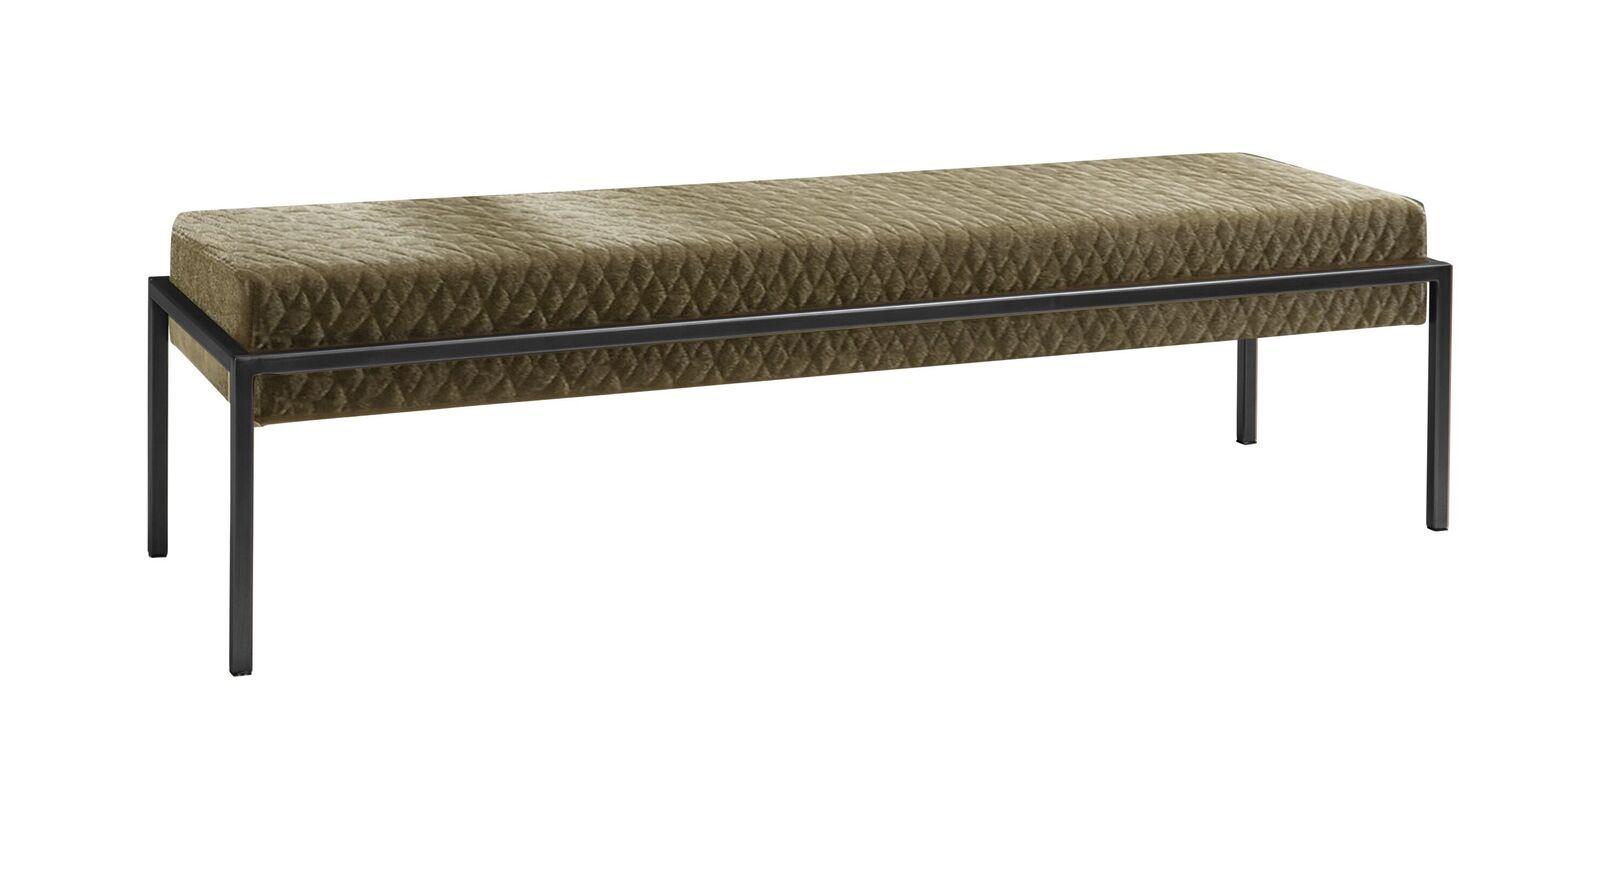 Bettbank Gran Rosario mit anthrazitfarbenem Metallgestell